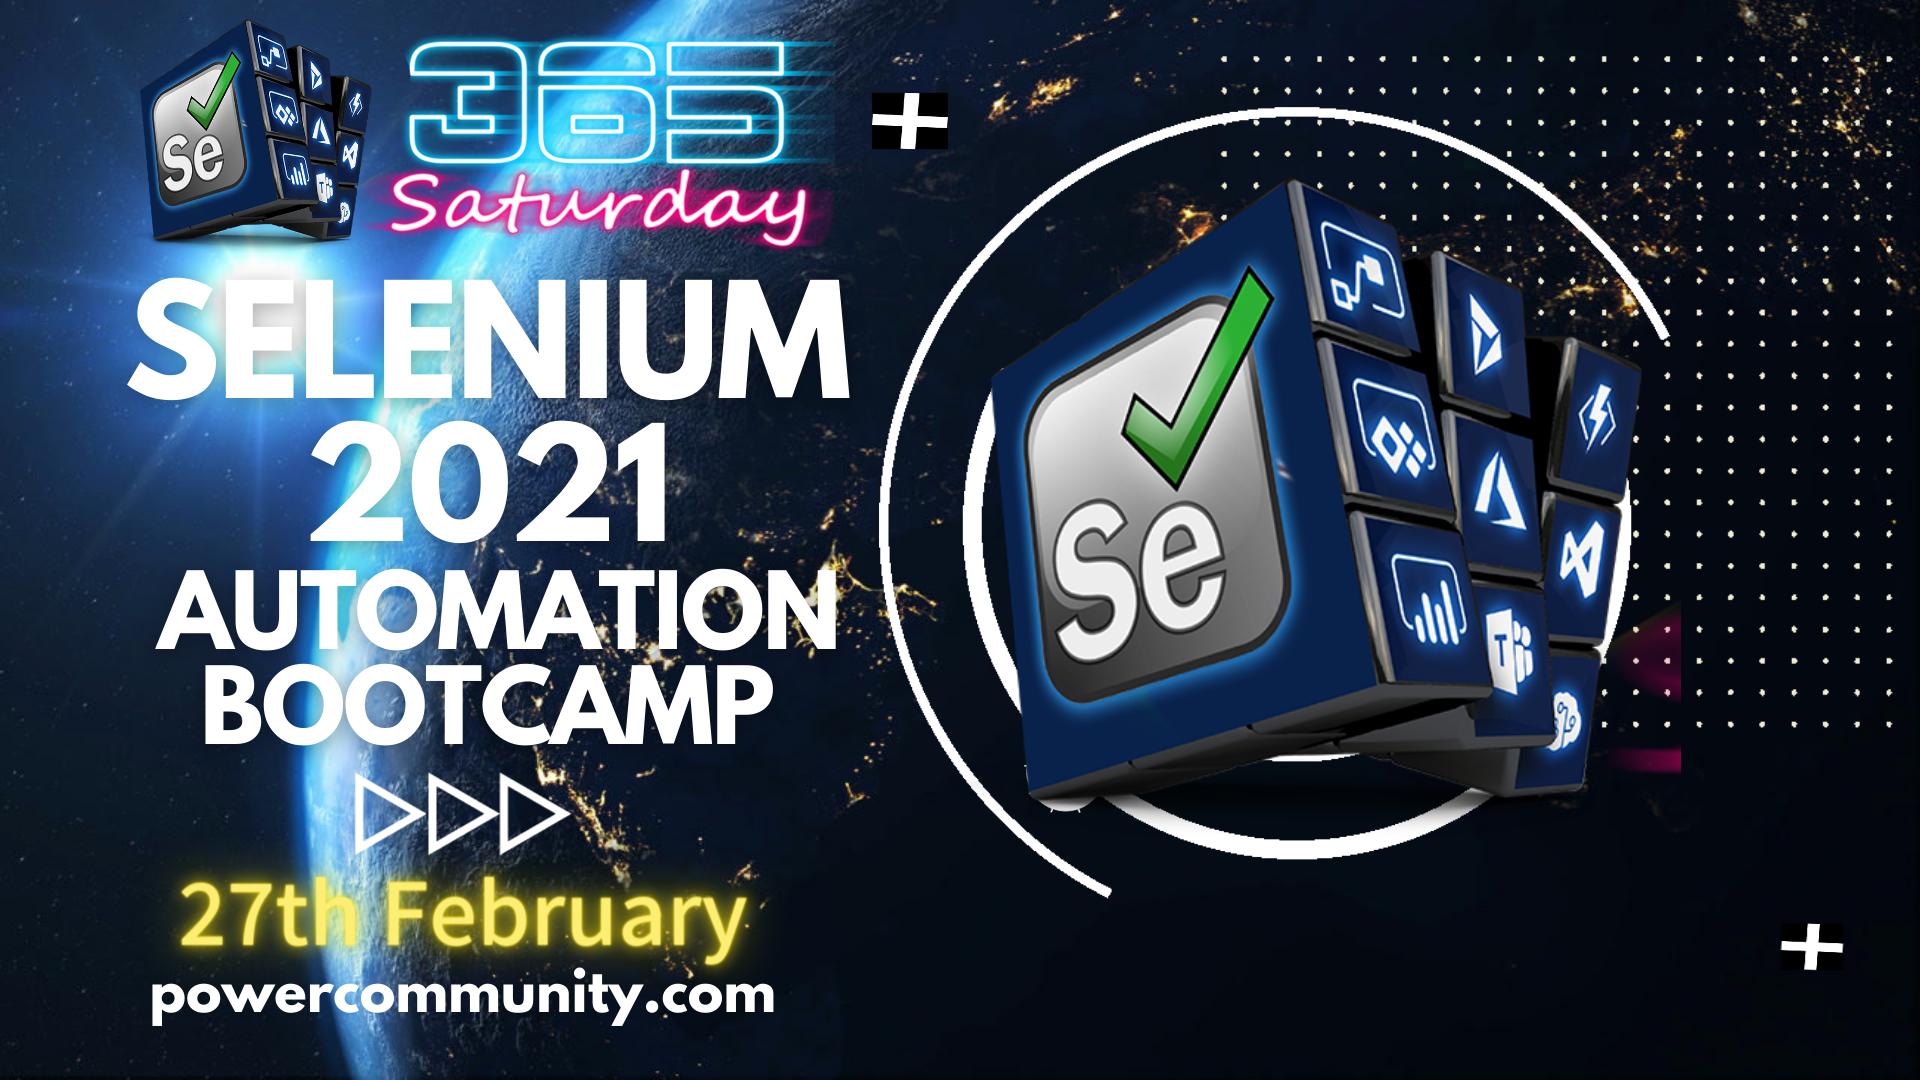 Selenium Saturday Bootcamp